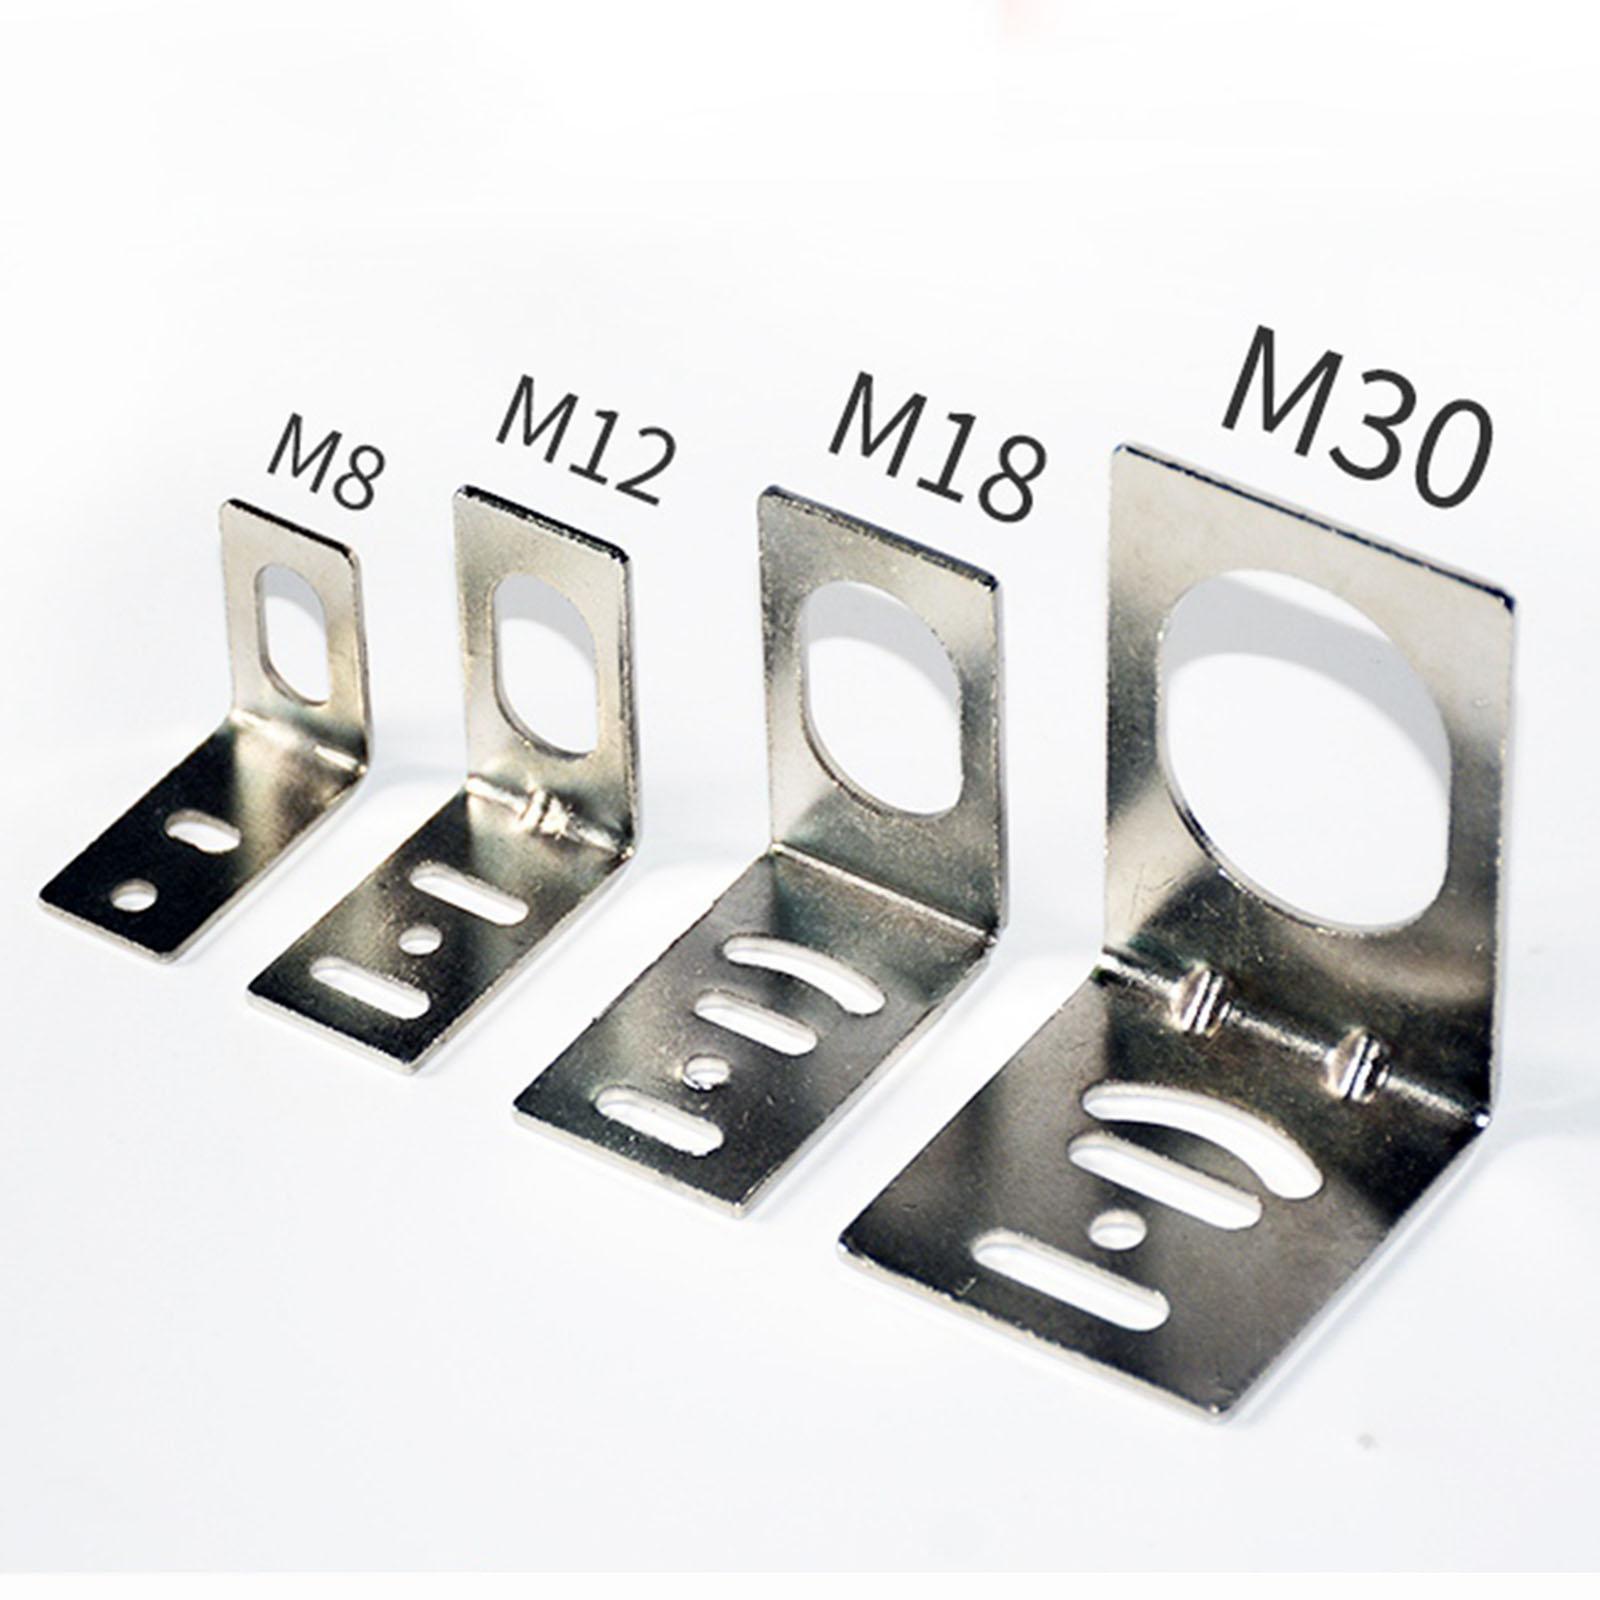 L Shaped Bracket Mount For M8/M12/M18/M30 Proximity Sensors Switch Support